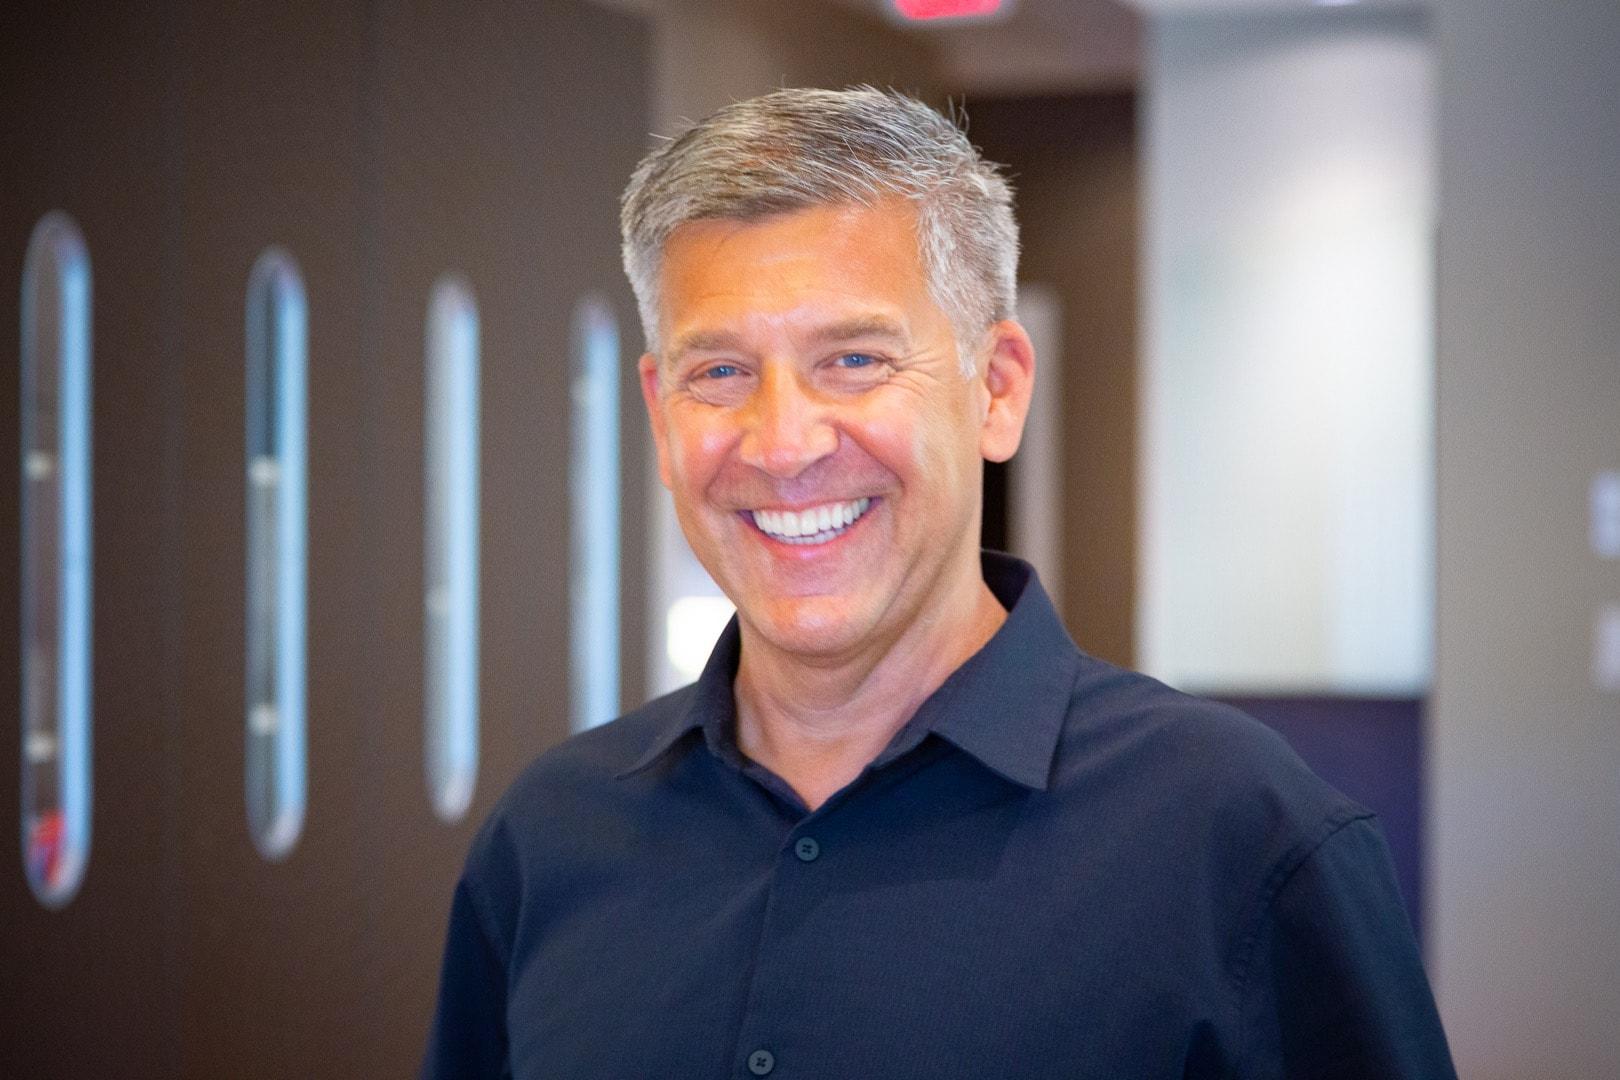 Portraits Oceans Edge Orthodontics 2020 Nanaimo Canada Orthodontist 3 - Meet Dr. Murdoch